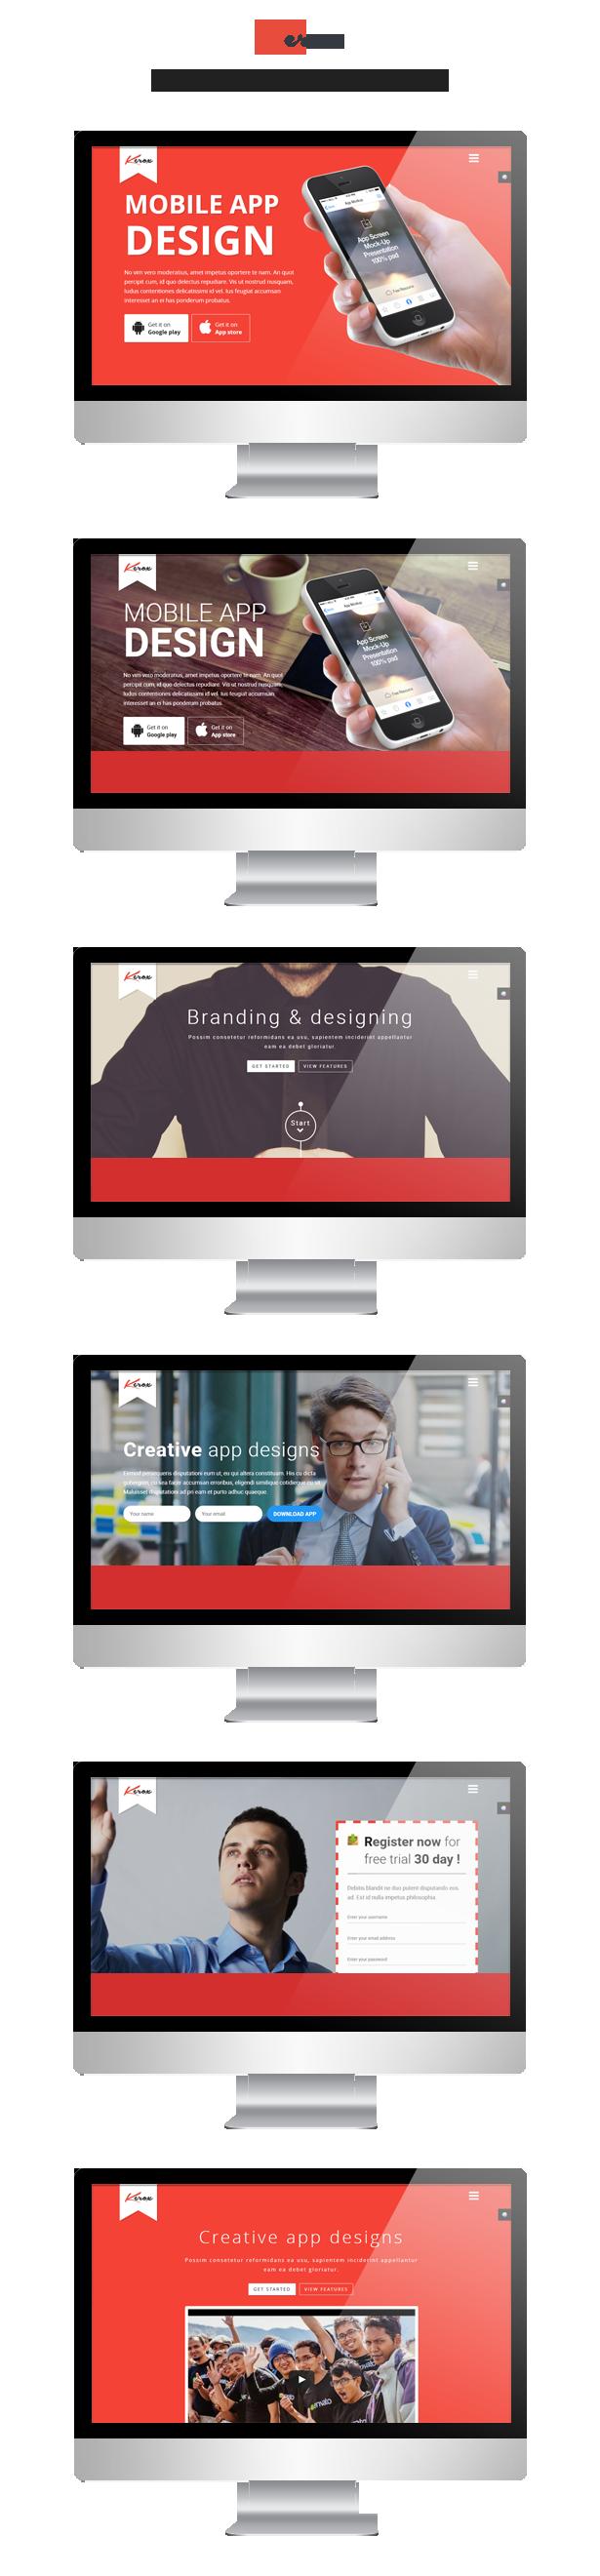 Kerox responsive app landing page